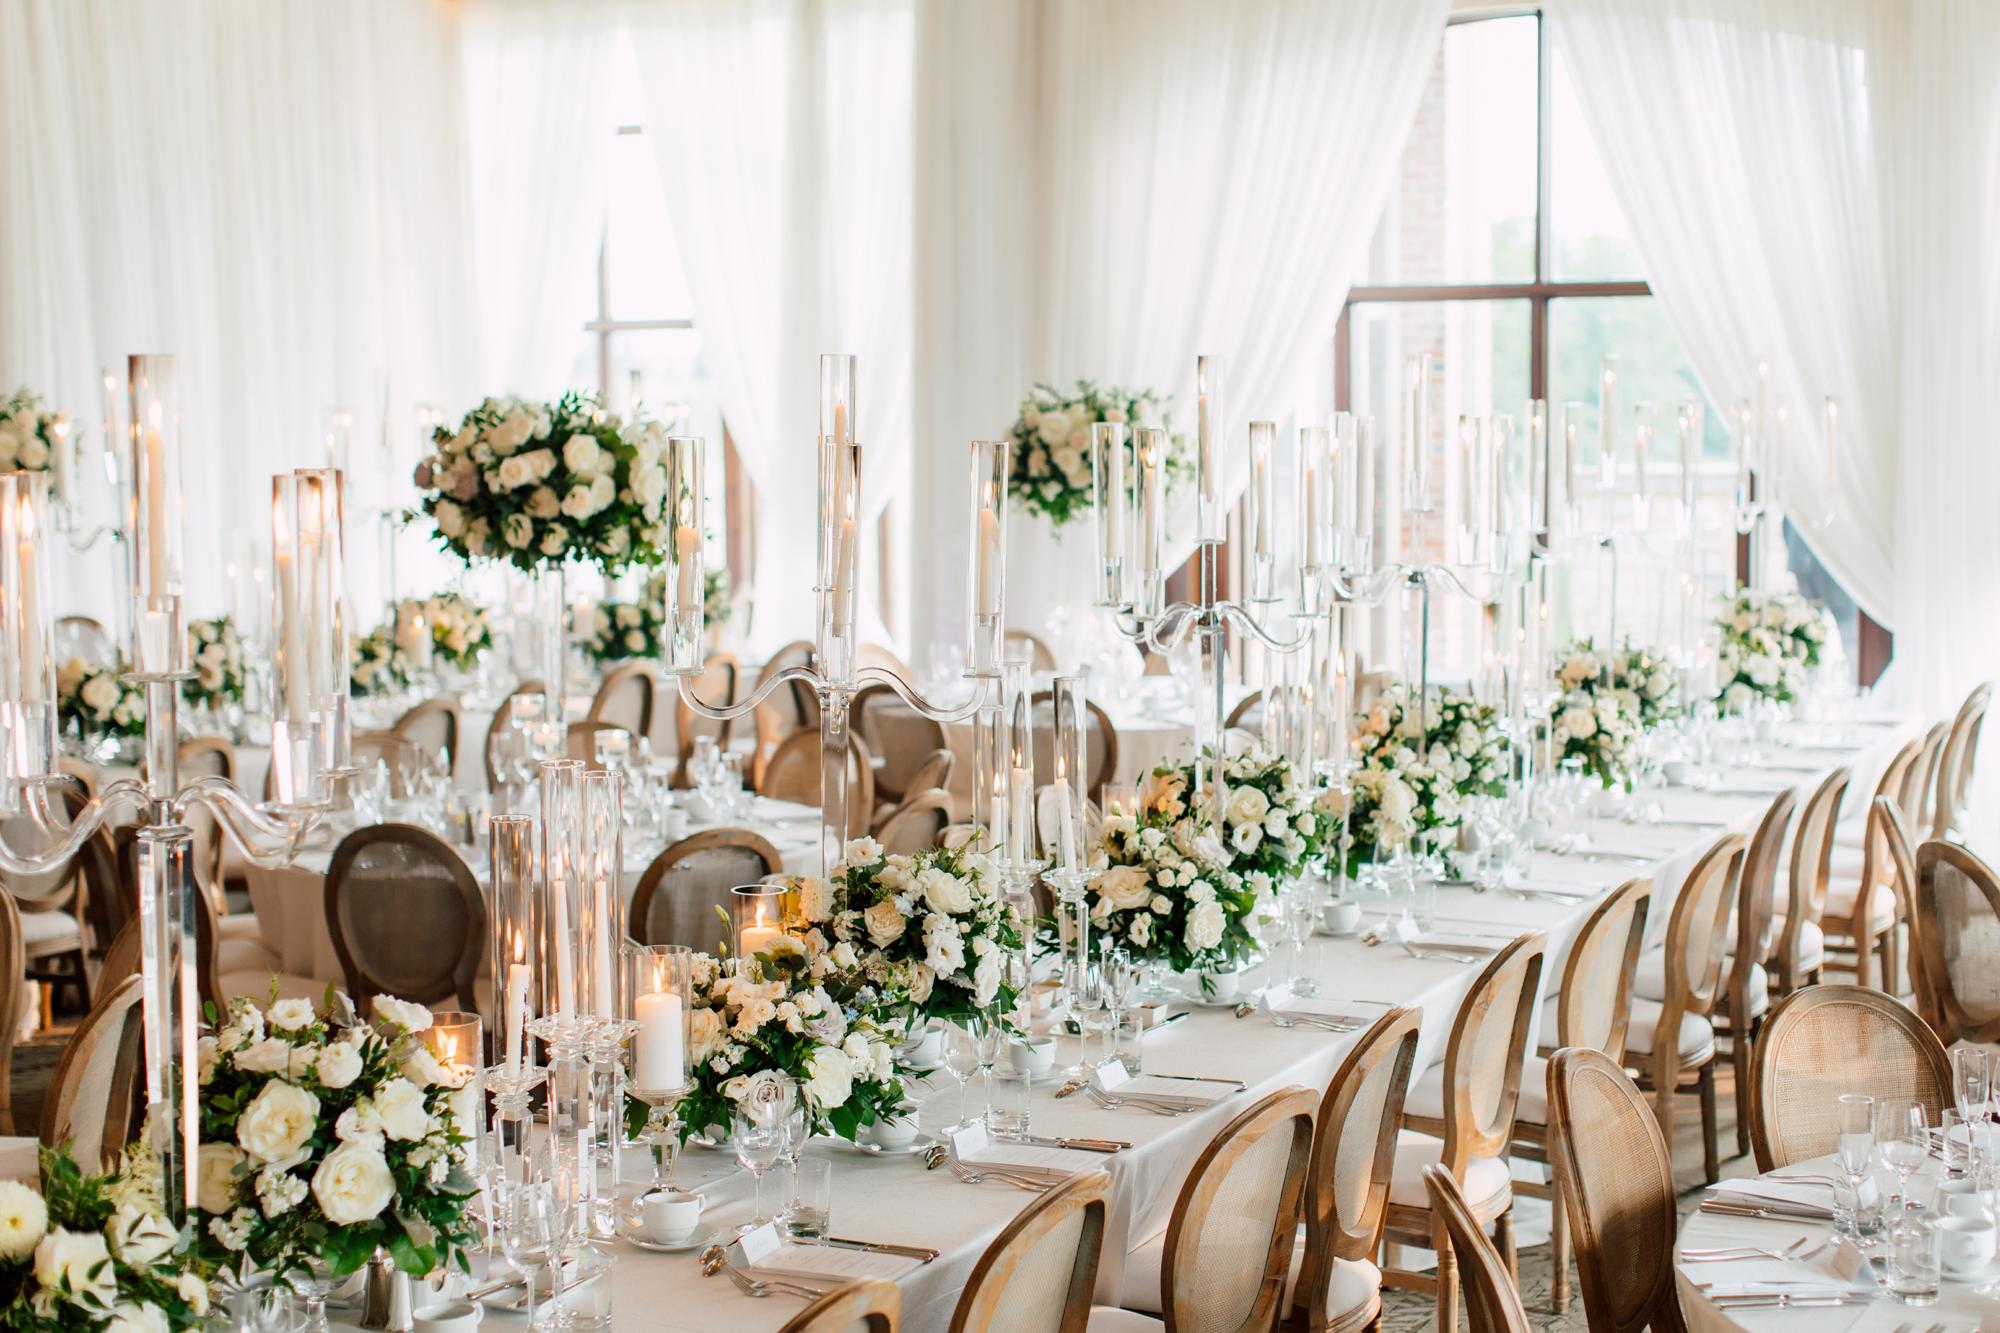 shealyn angus wedding planning